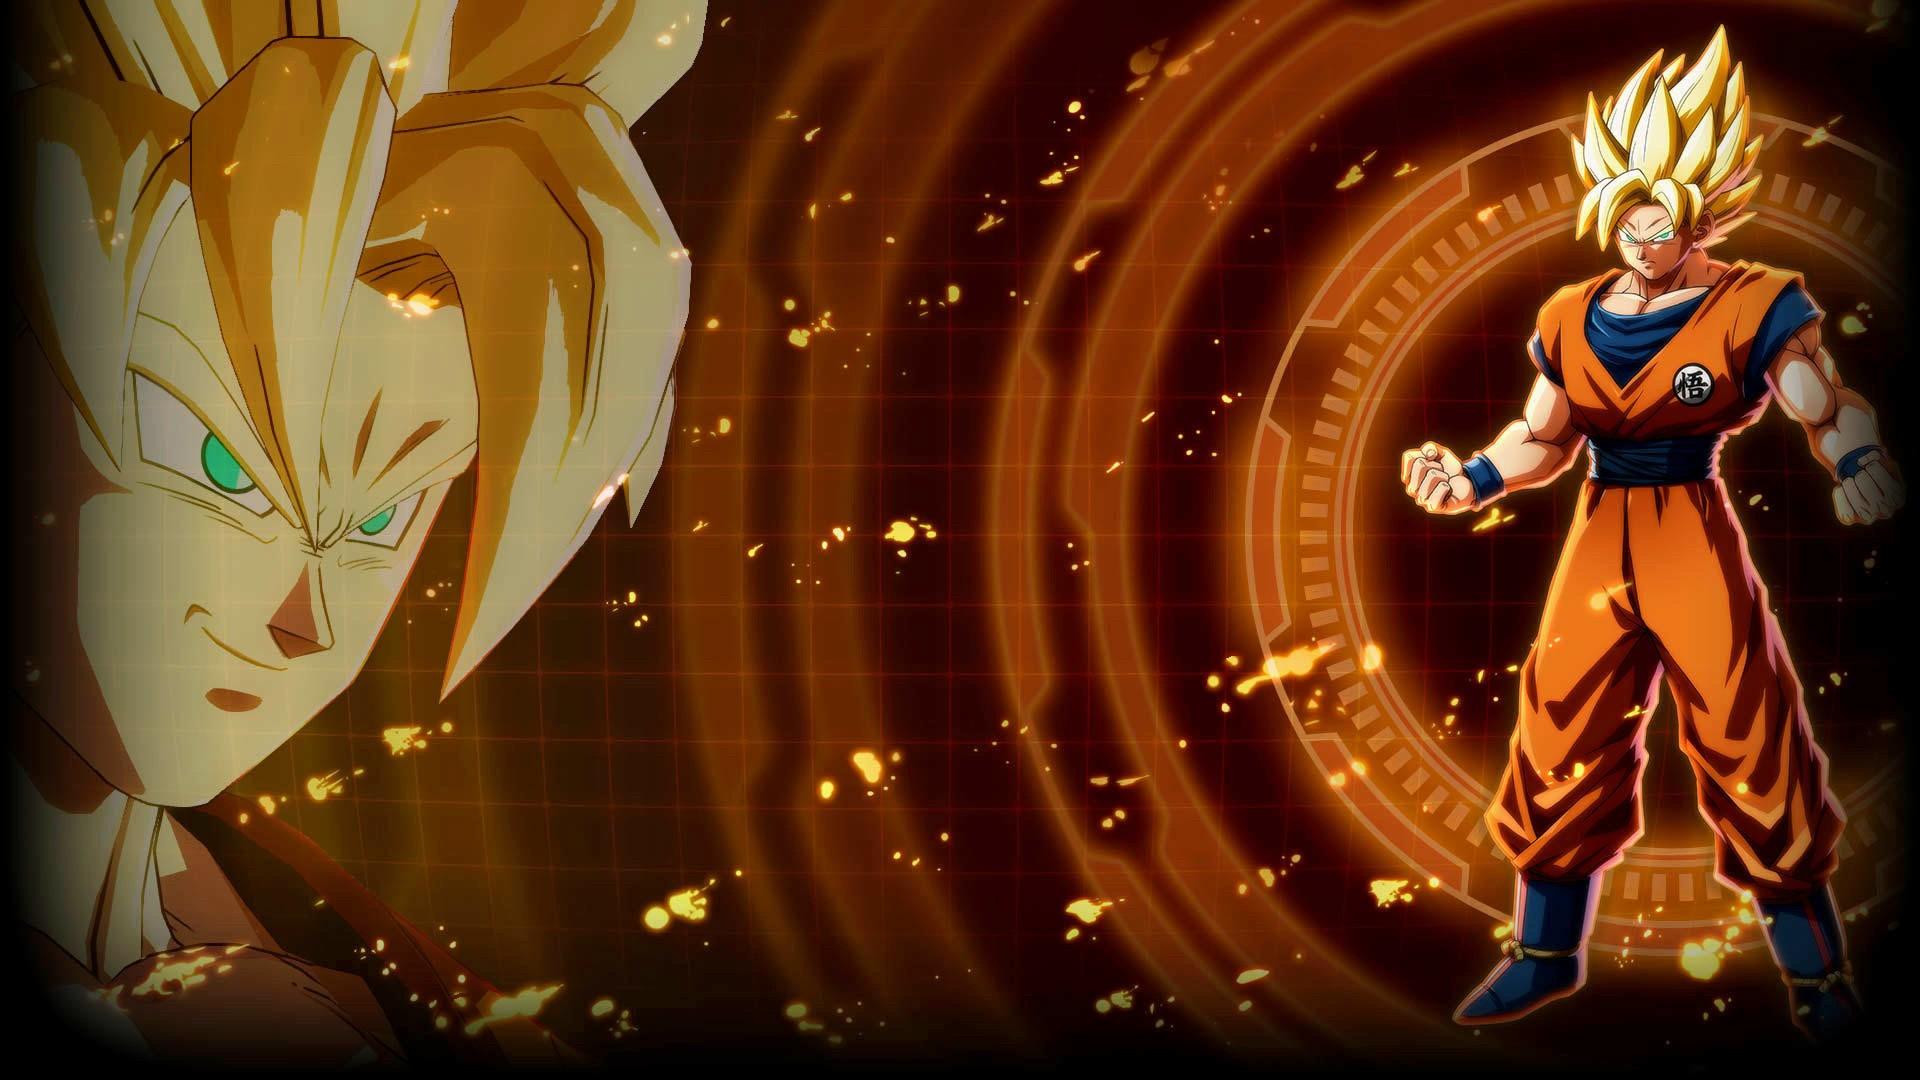 Dragon Ball Z 3d Wallpaper Download Dragon Ball Fighterz Goku Wallpapers Hd Wallpapers Id